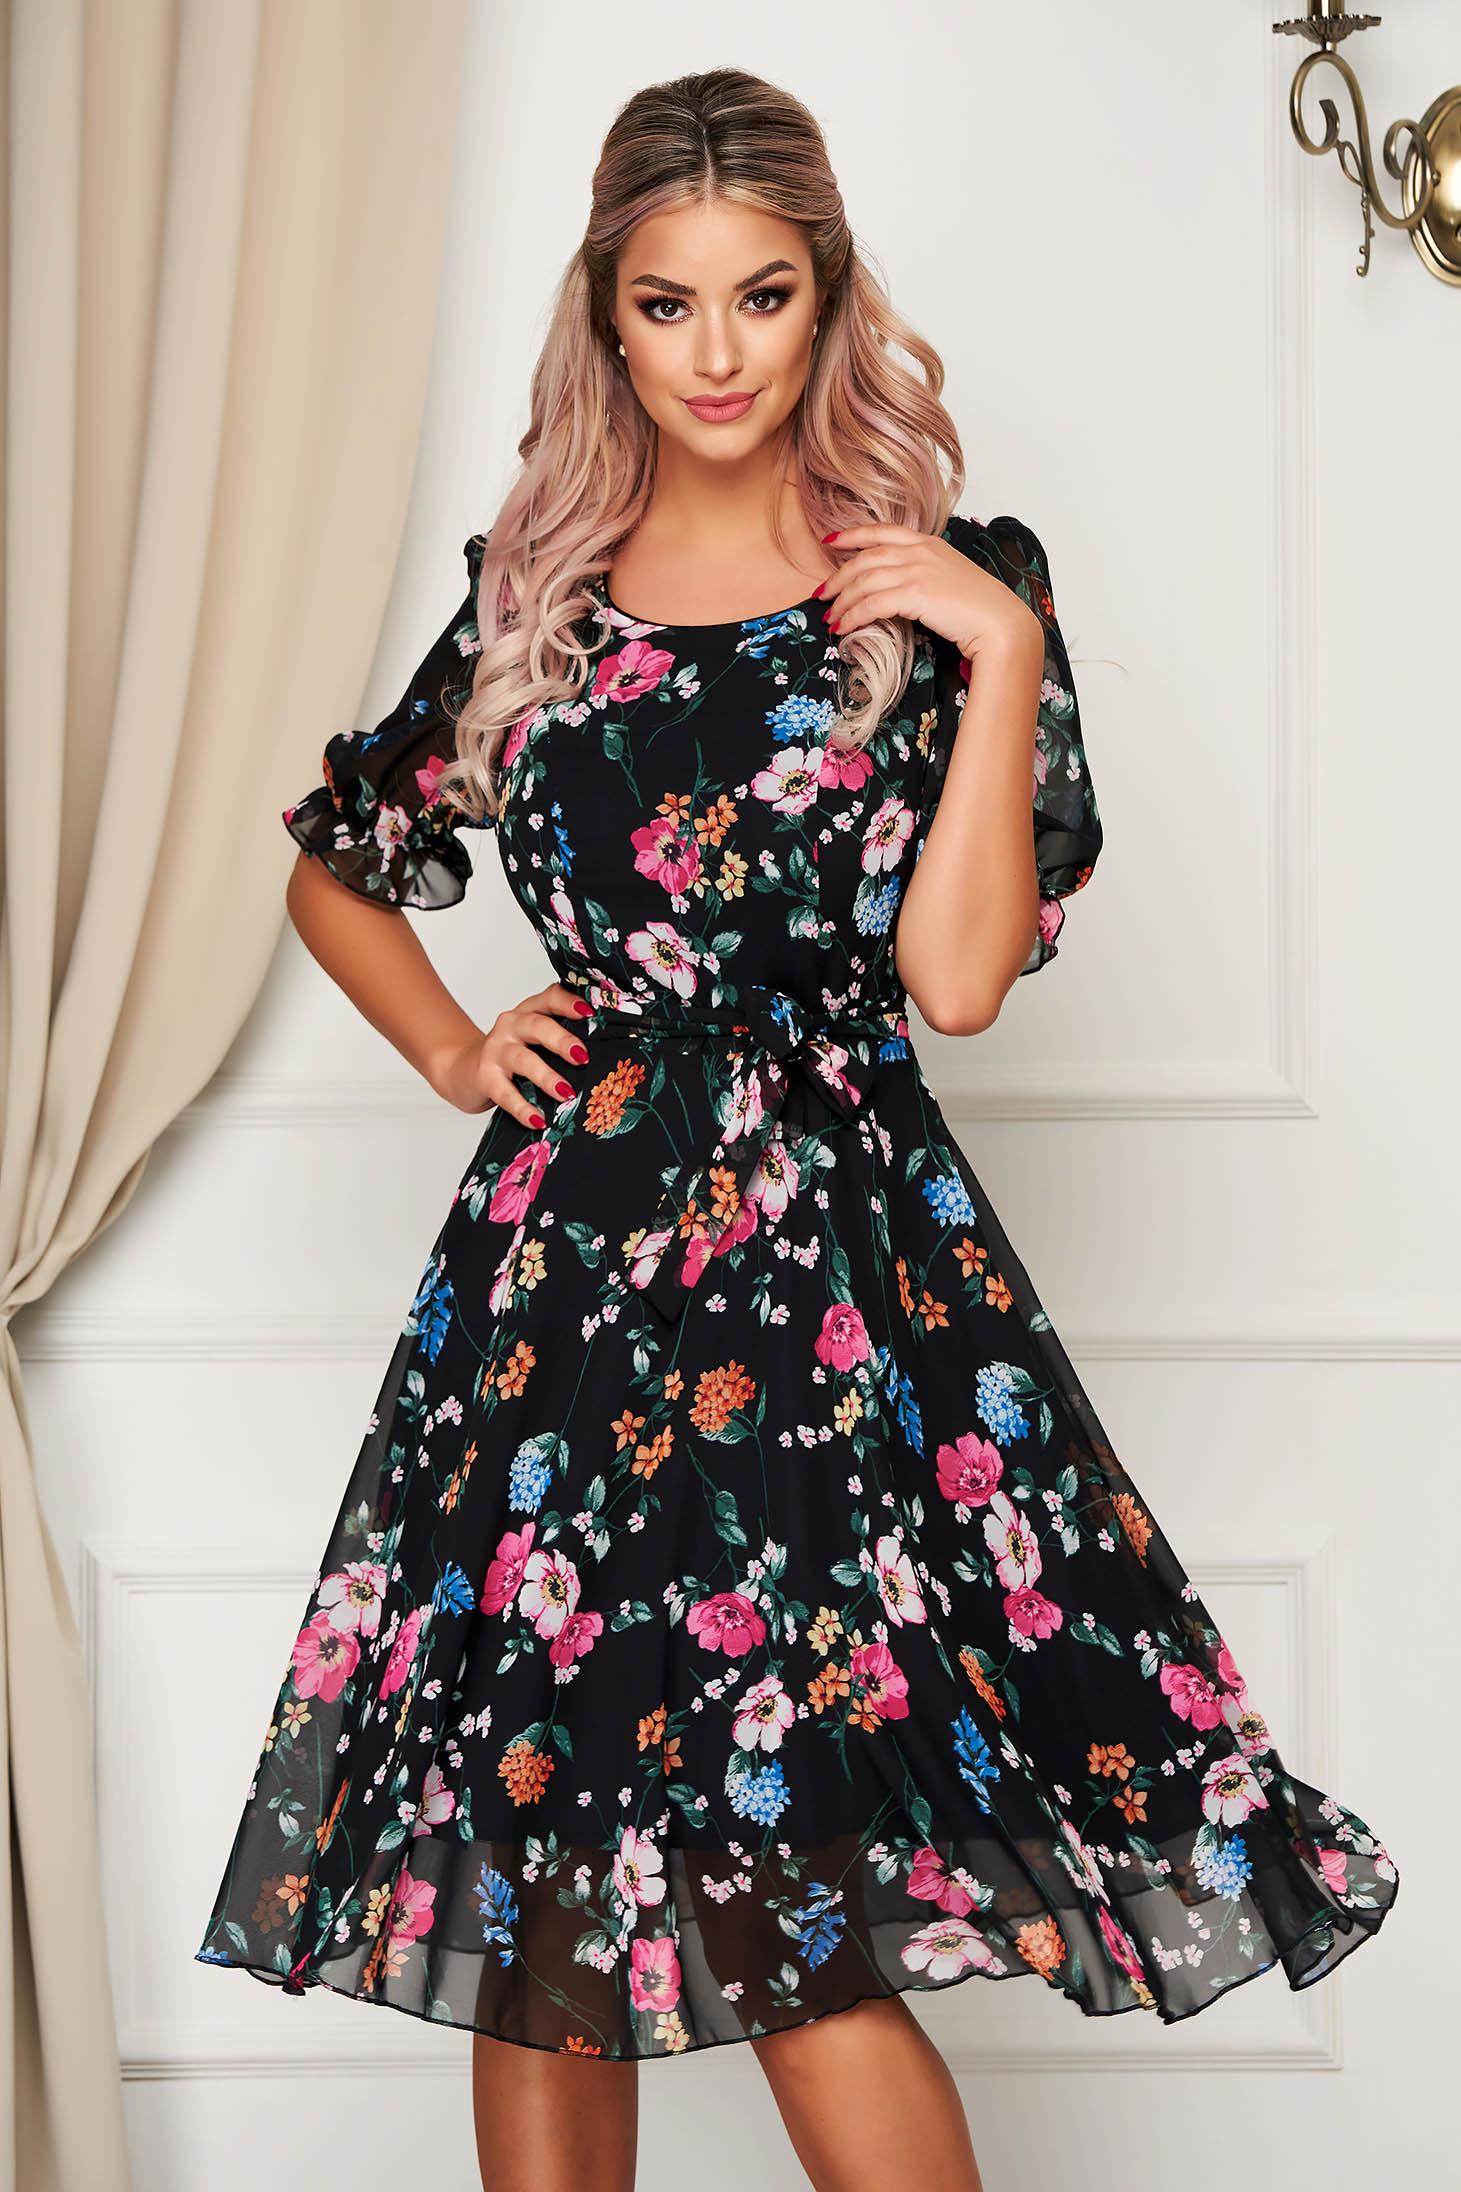 Black dress elegant midi cloche voile fabric with floral prints